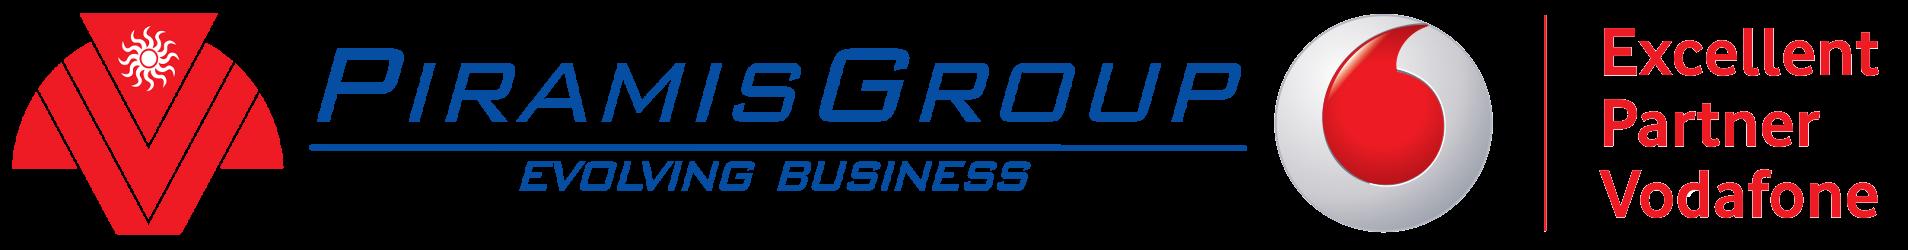 Logo Piramis Group + Excellent Partner con firma